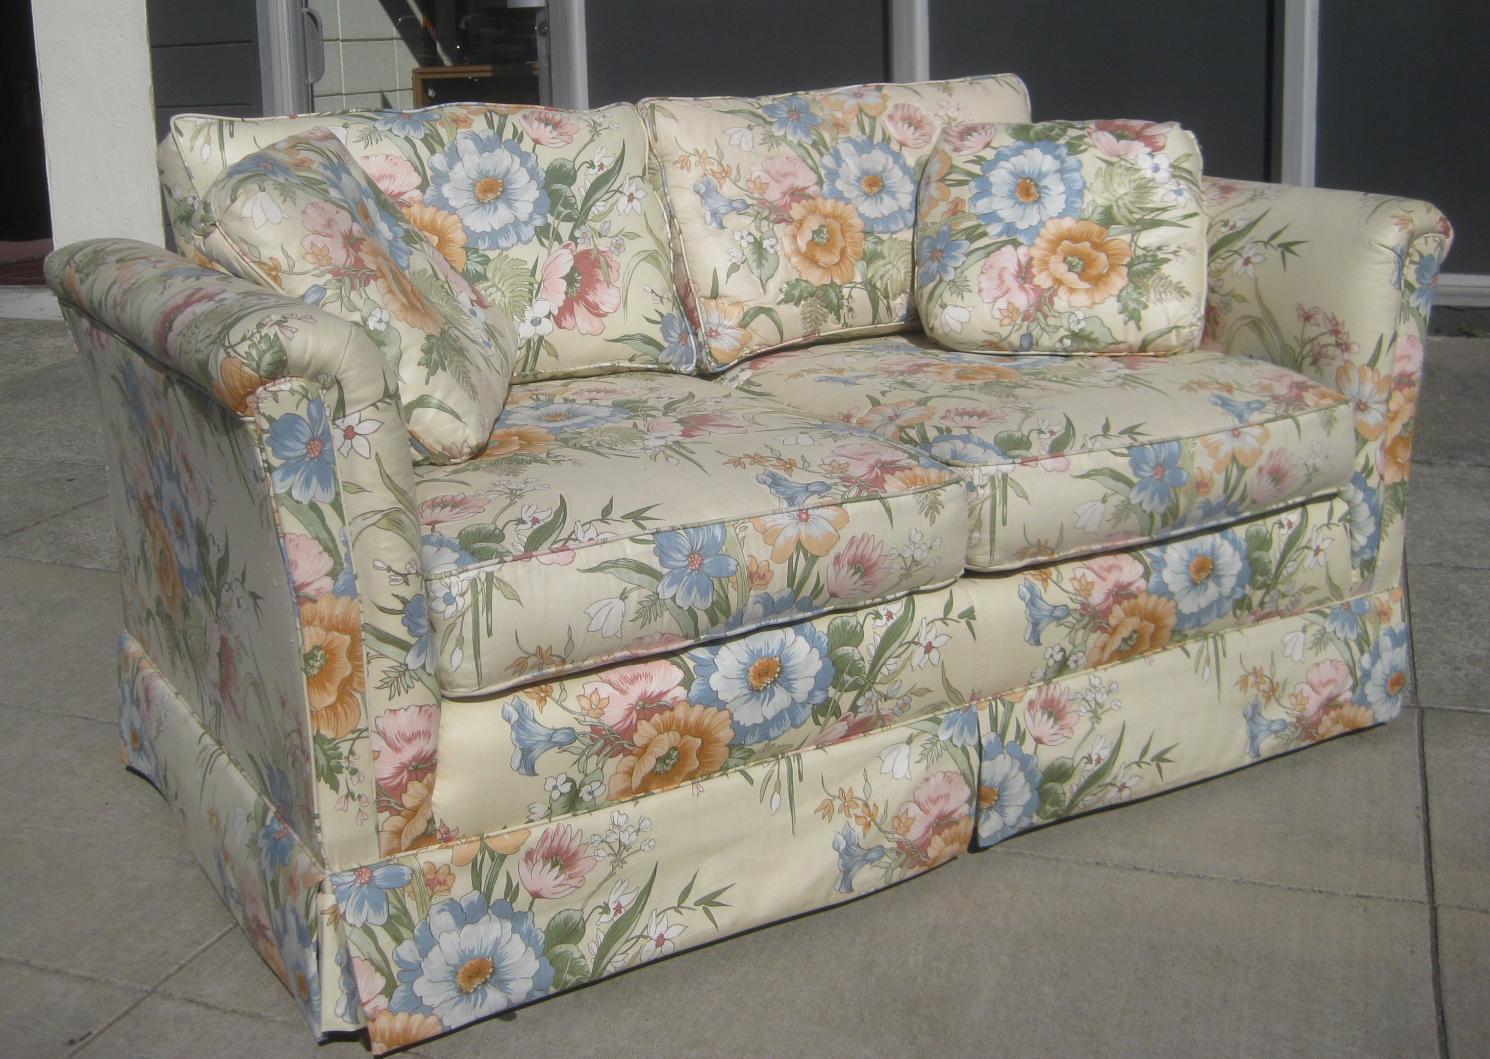 Uhuru Furniture Amp Collectibles Sold Floral Loveseat 40